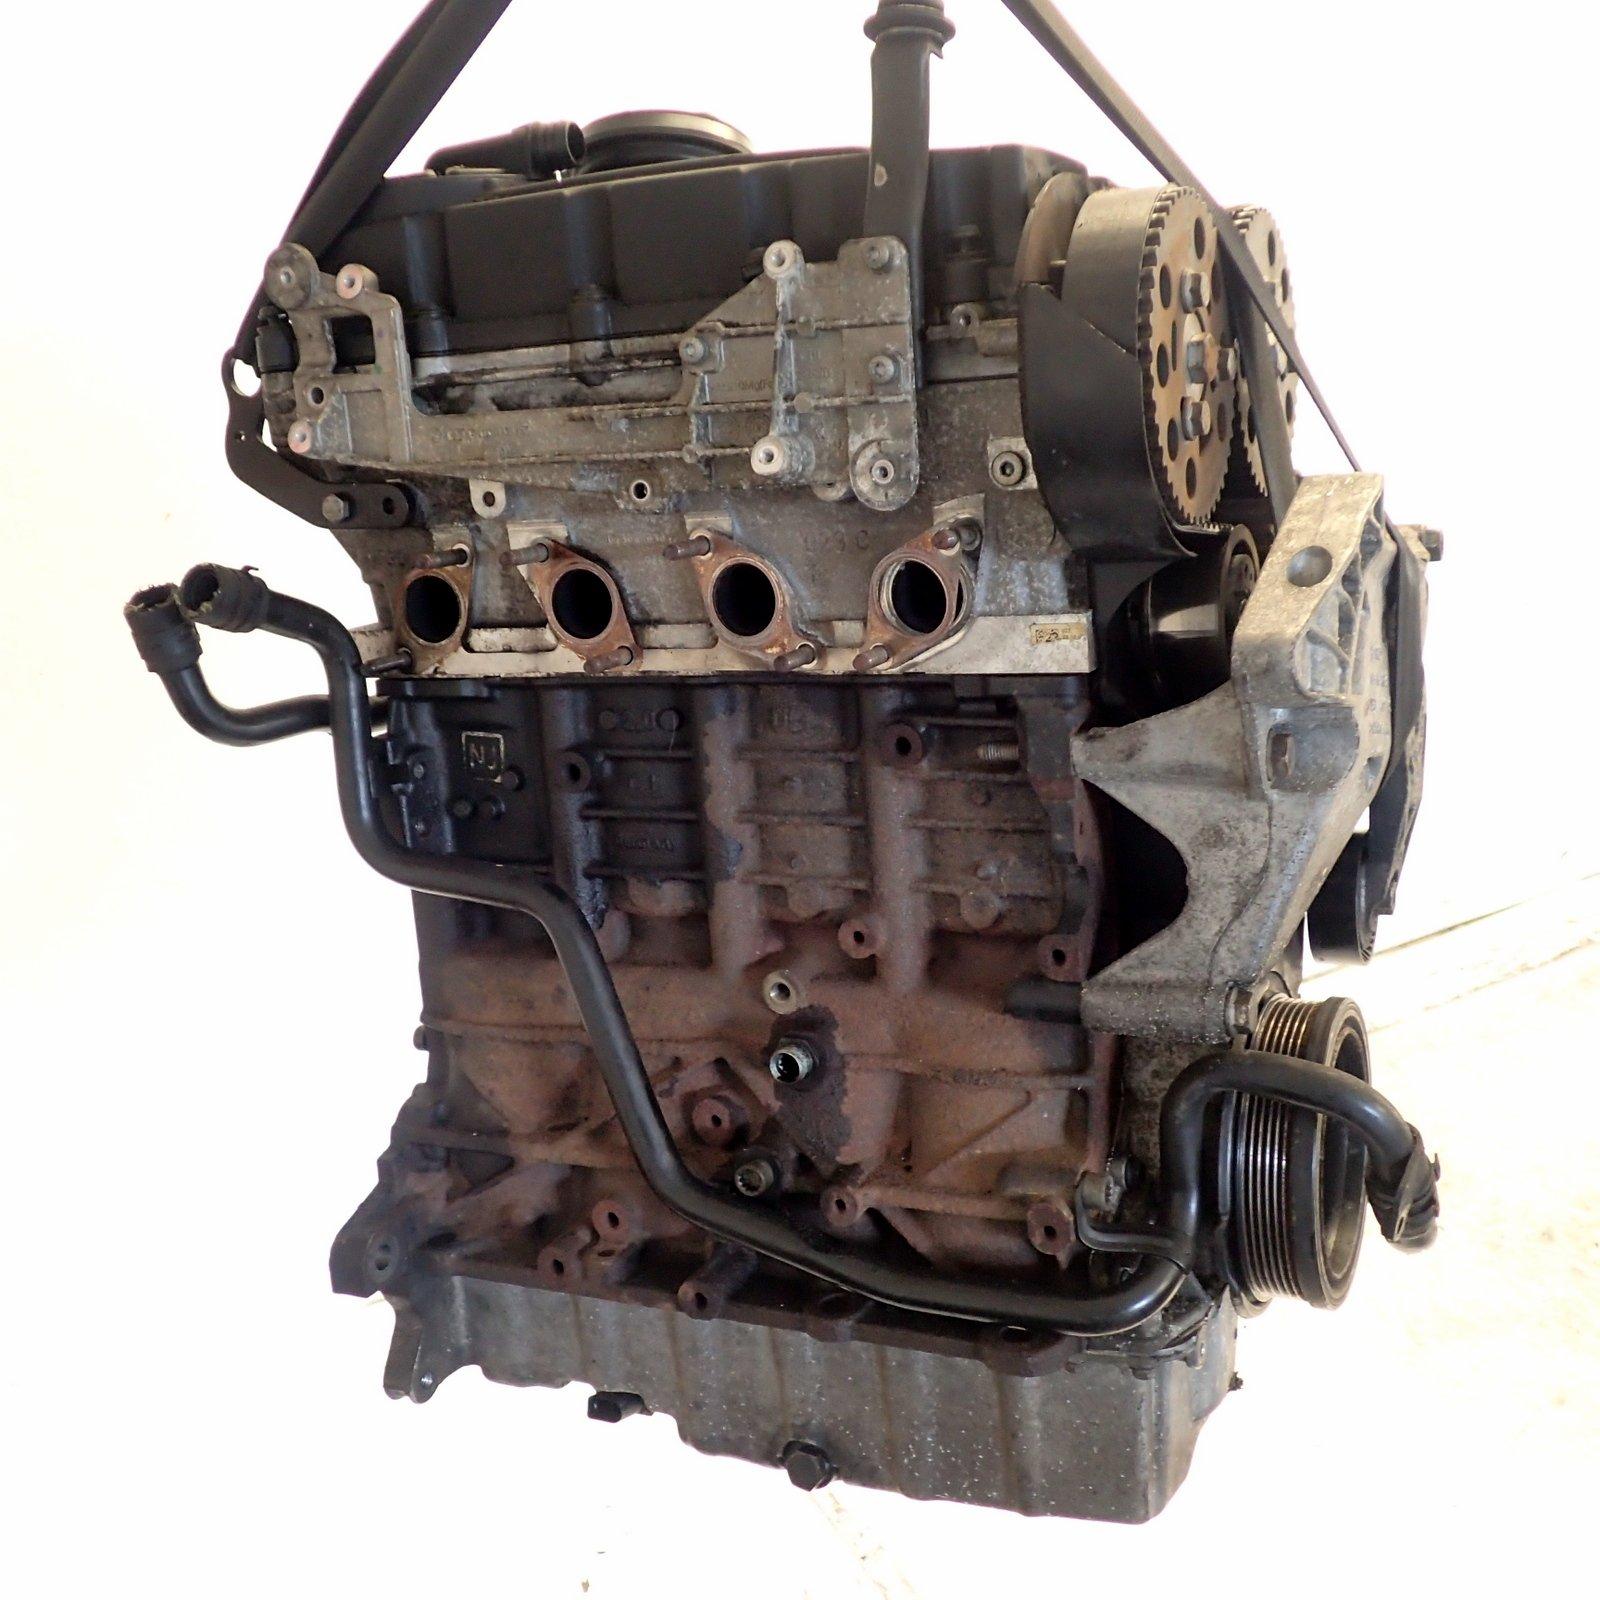 Engine-Bare-BKD-Ref-1252-VW-Touran-mk1-2-0-Tdi thumbnail 2